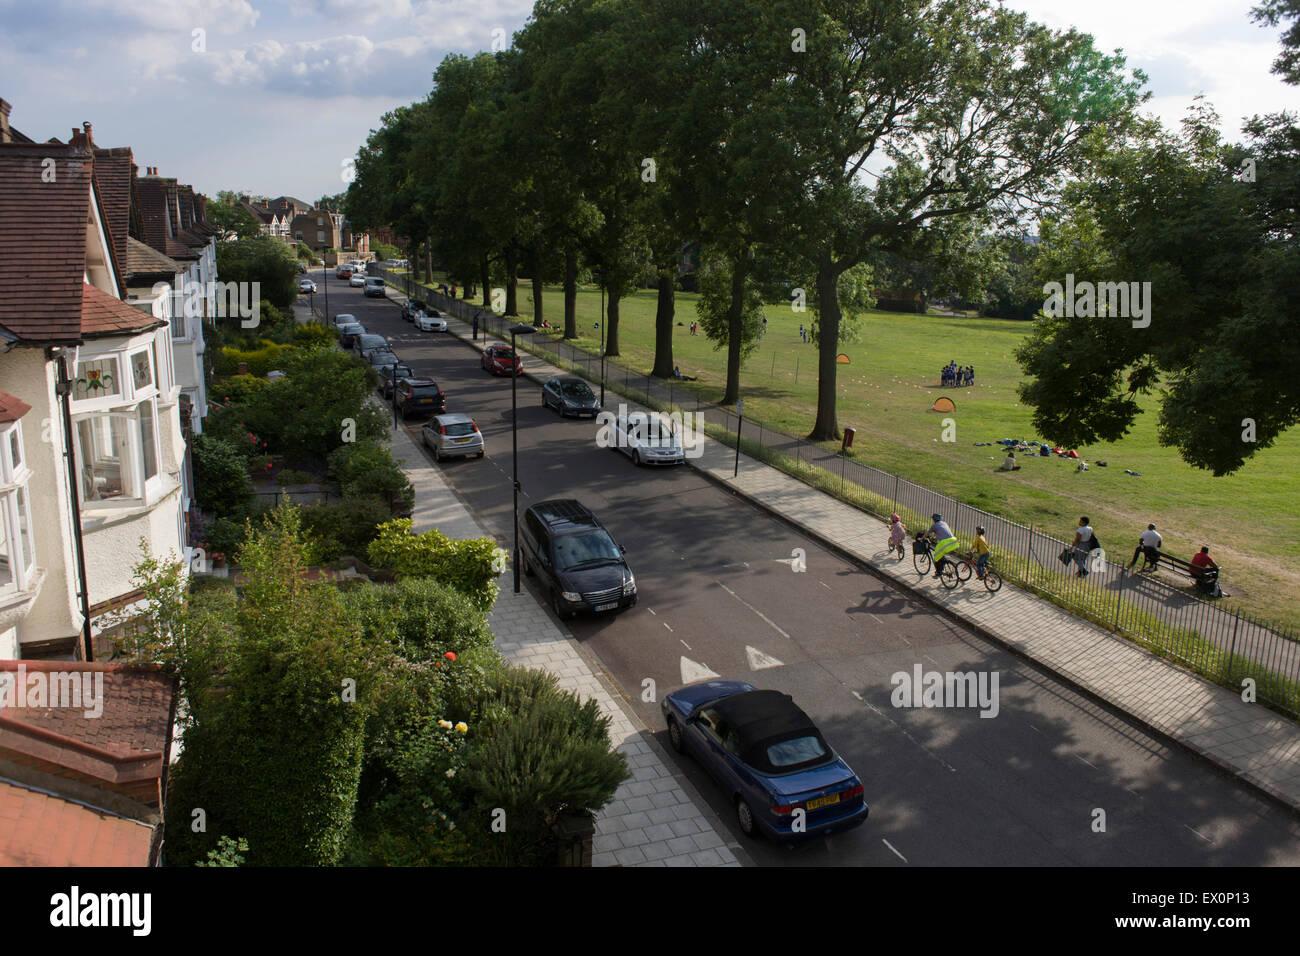 aerial-view-of-suburban-edwardian-semi-d